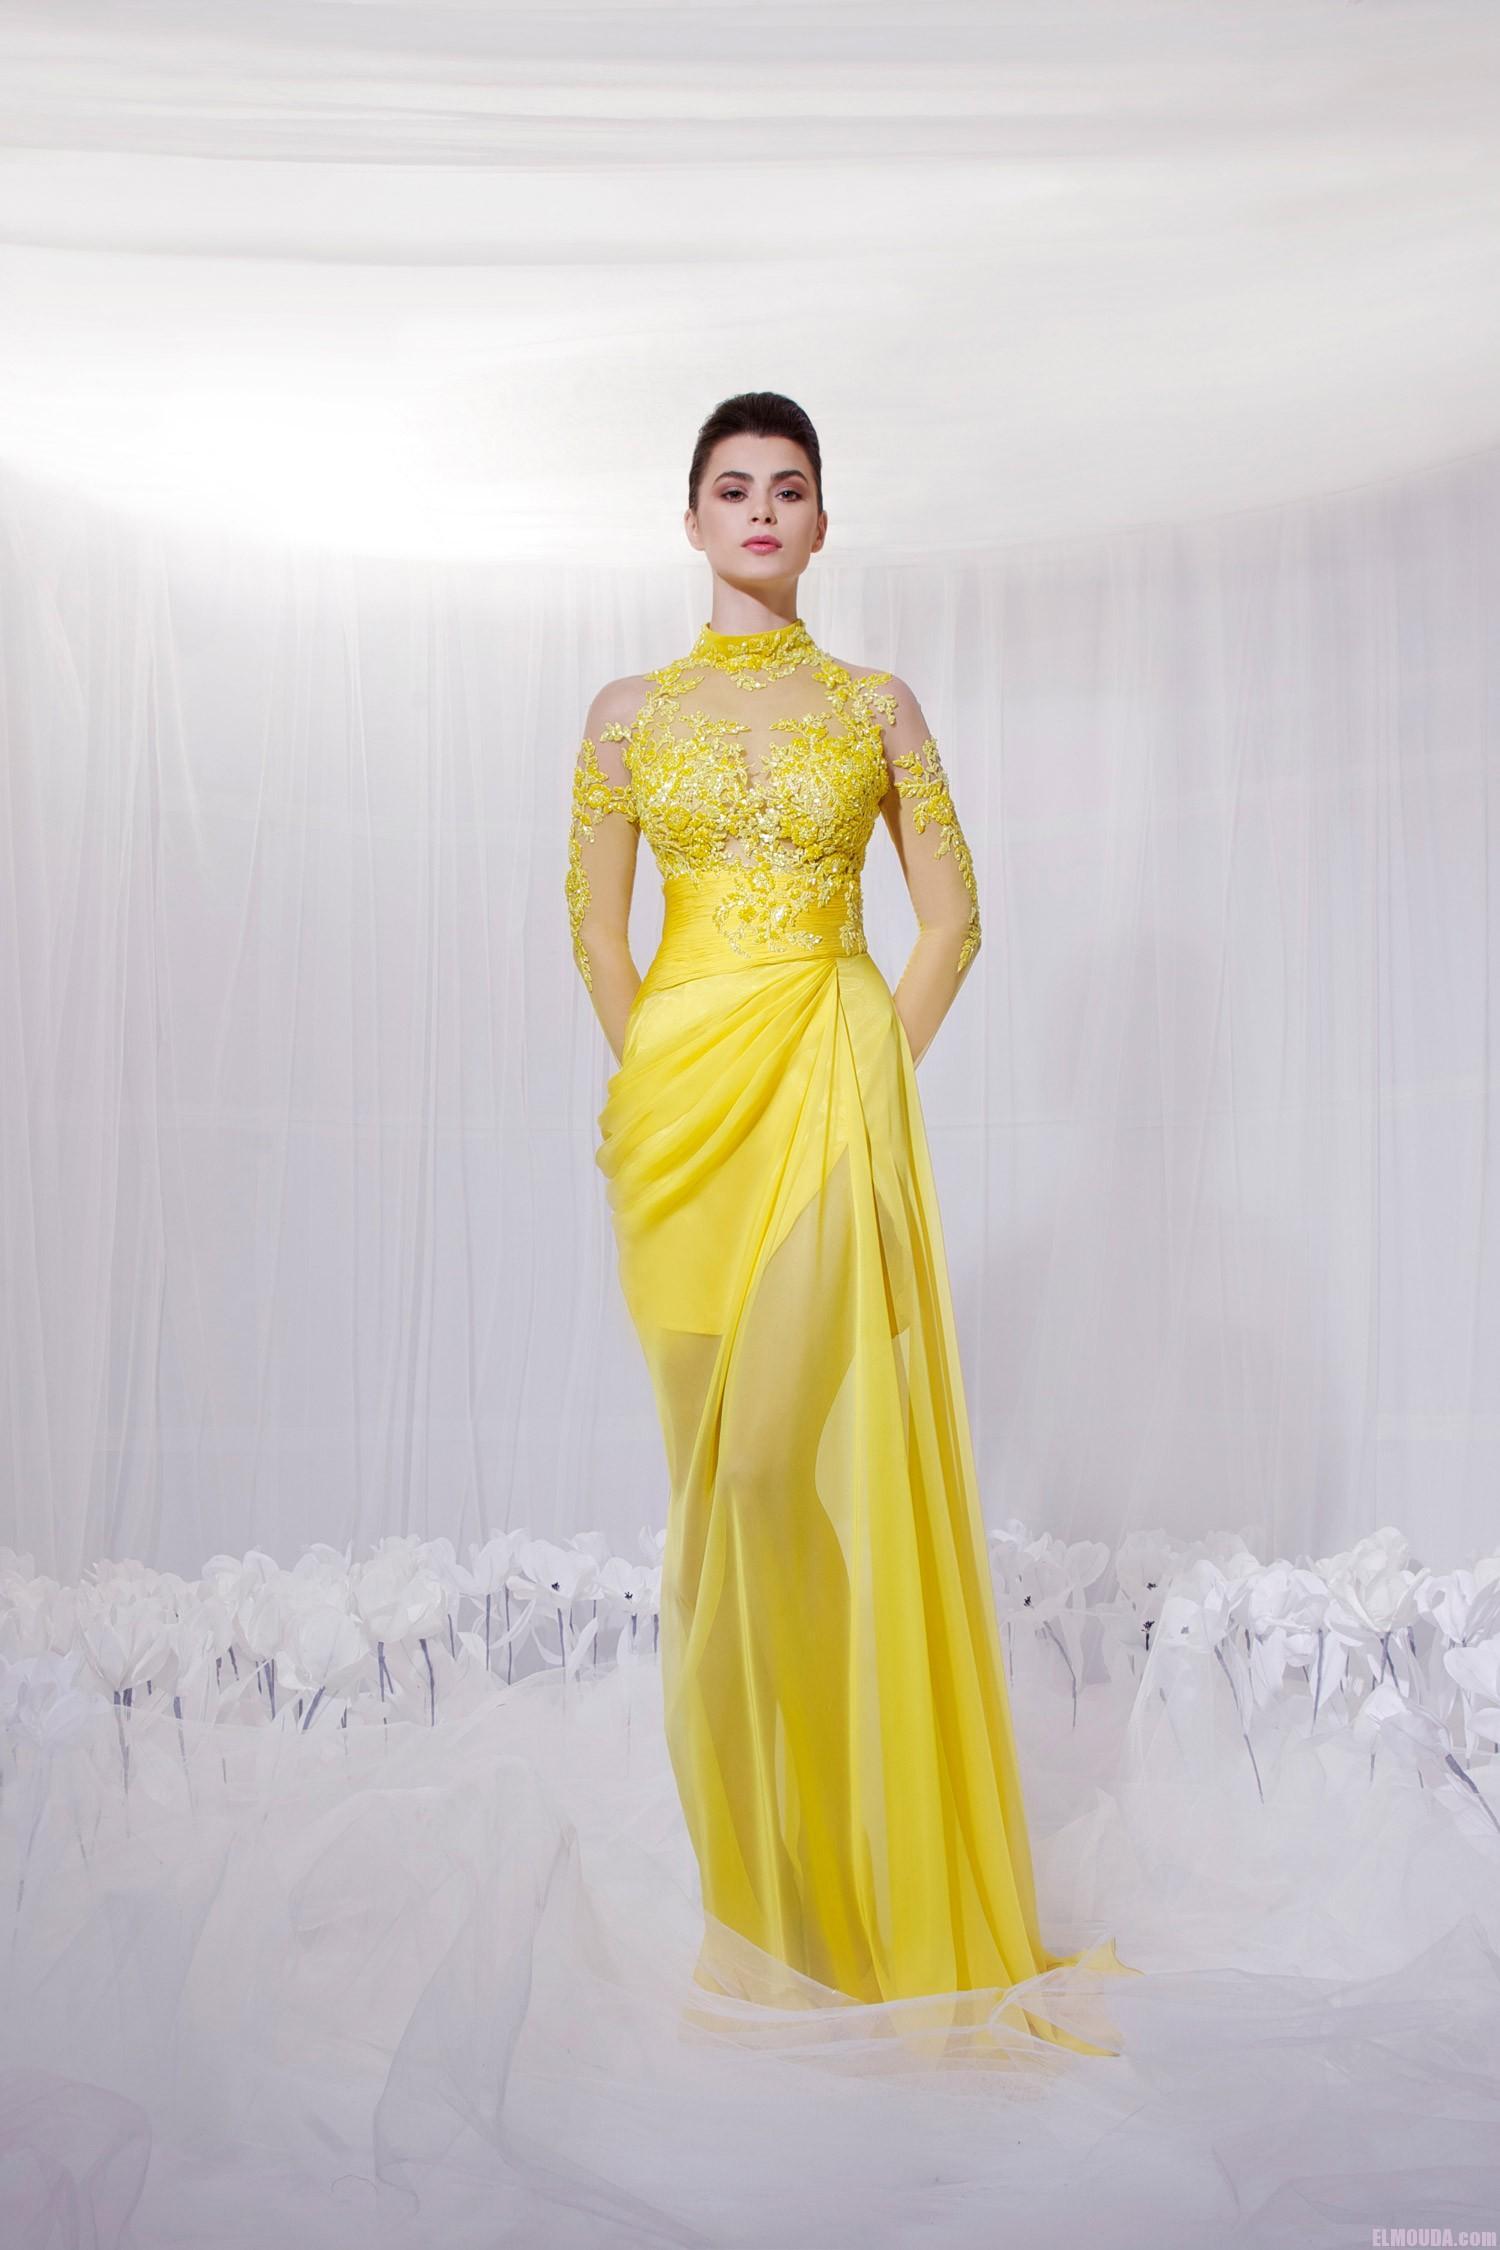 7531db1be3 Yükle (1500x2250)Fabulous Dresses - Tarek Sinno Haute Couture Spring Summer  2014 - fashionsy.comFabulous Dresses Tarek Sinno Haute Couture Spring Summer  ...